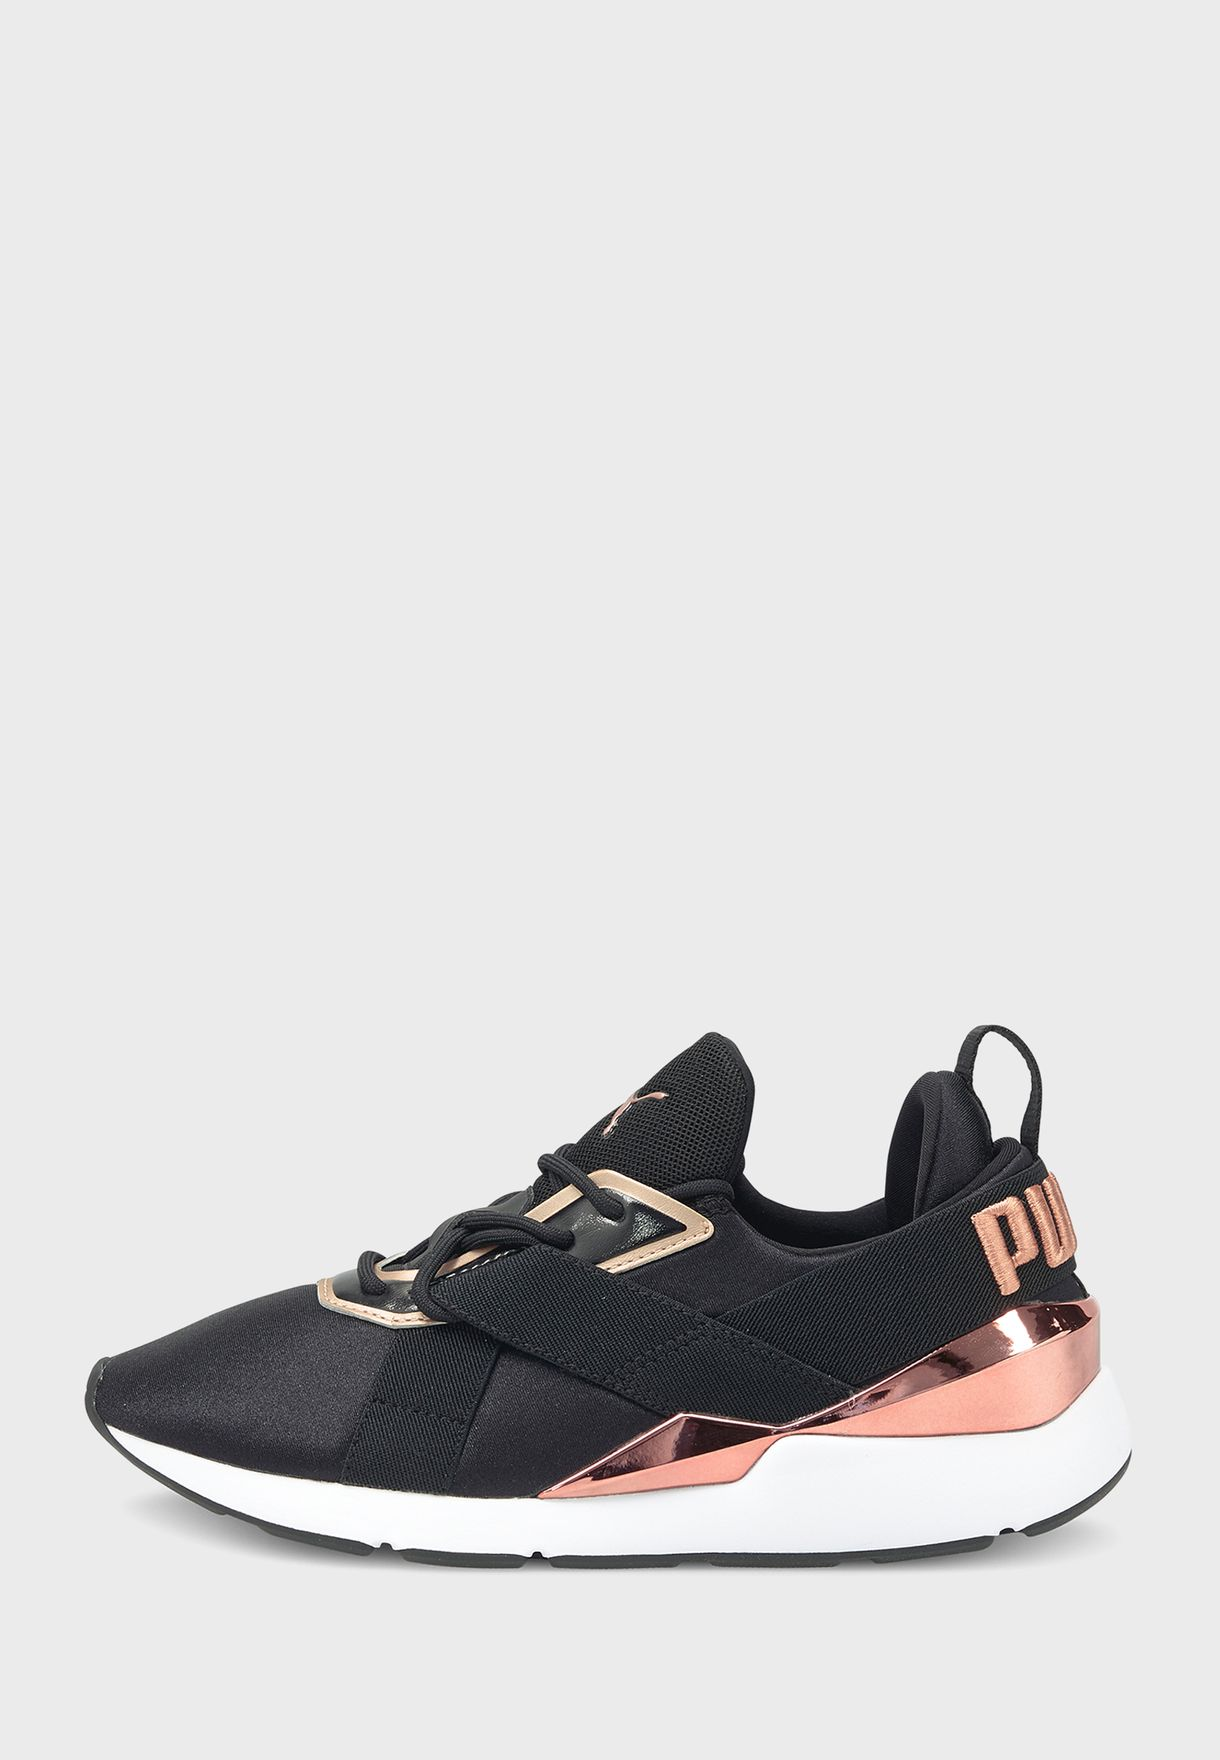 Muse women sneakers